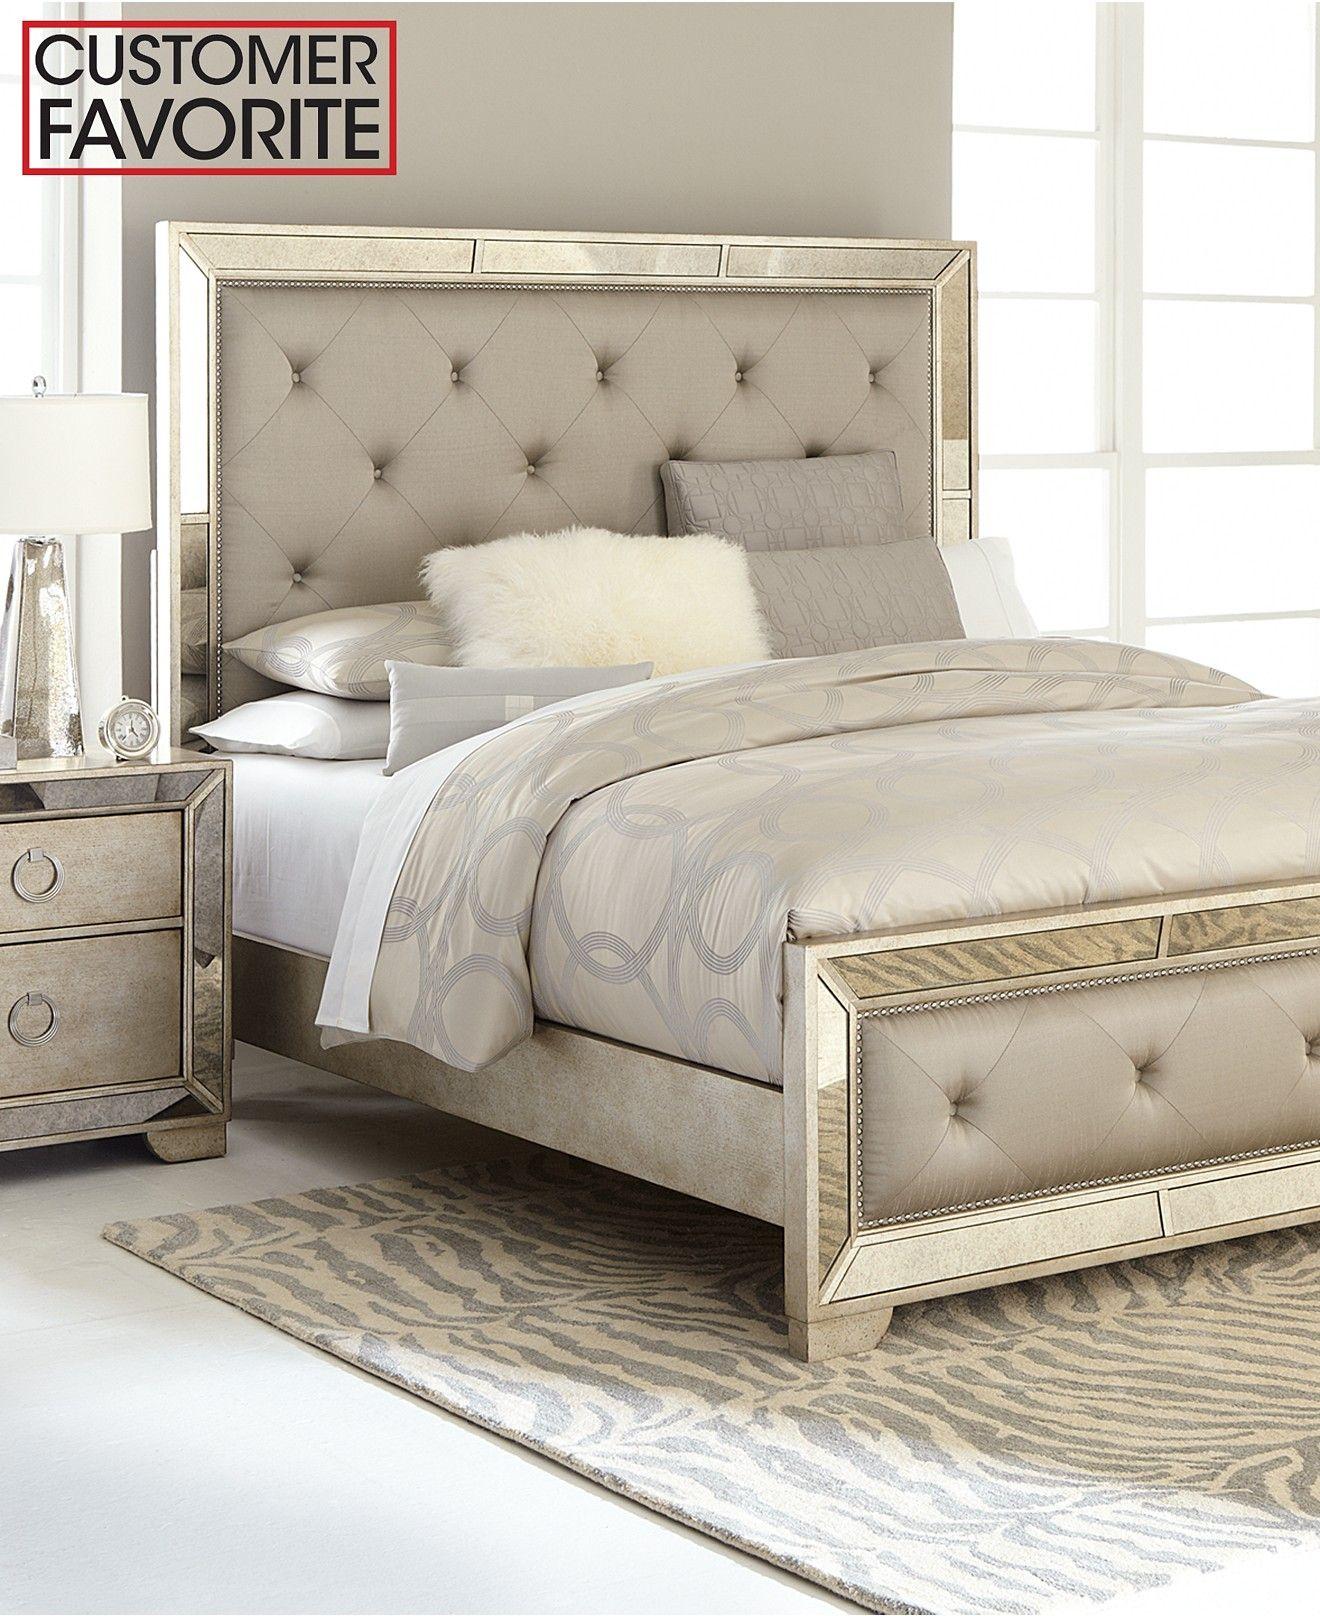 Ailey 3 Piece Queen Bedroom Set With Dresser   Bedroom Collections    Furniture   Macyu0027s